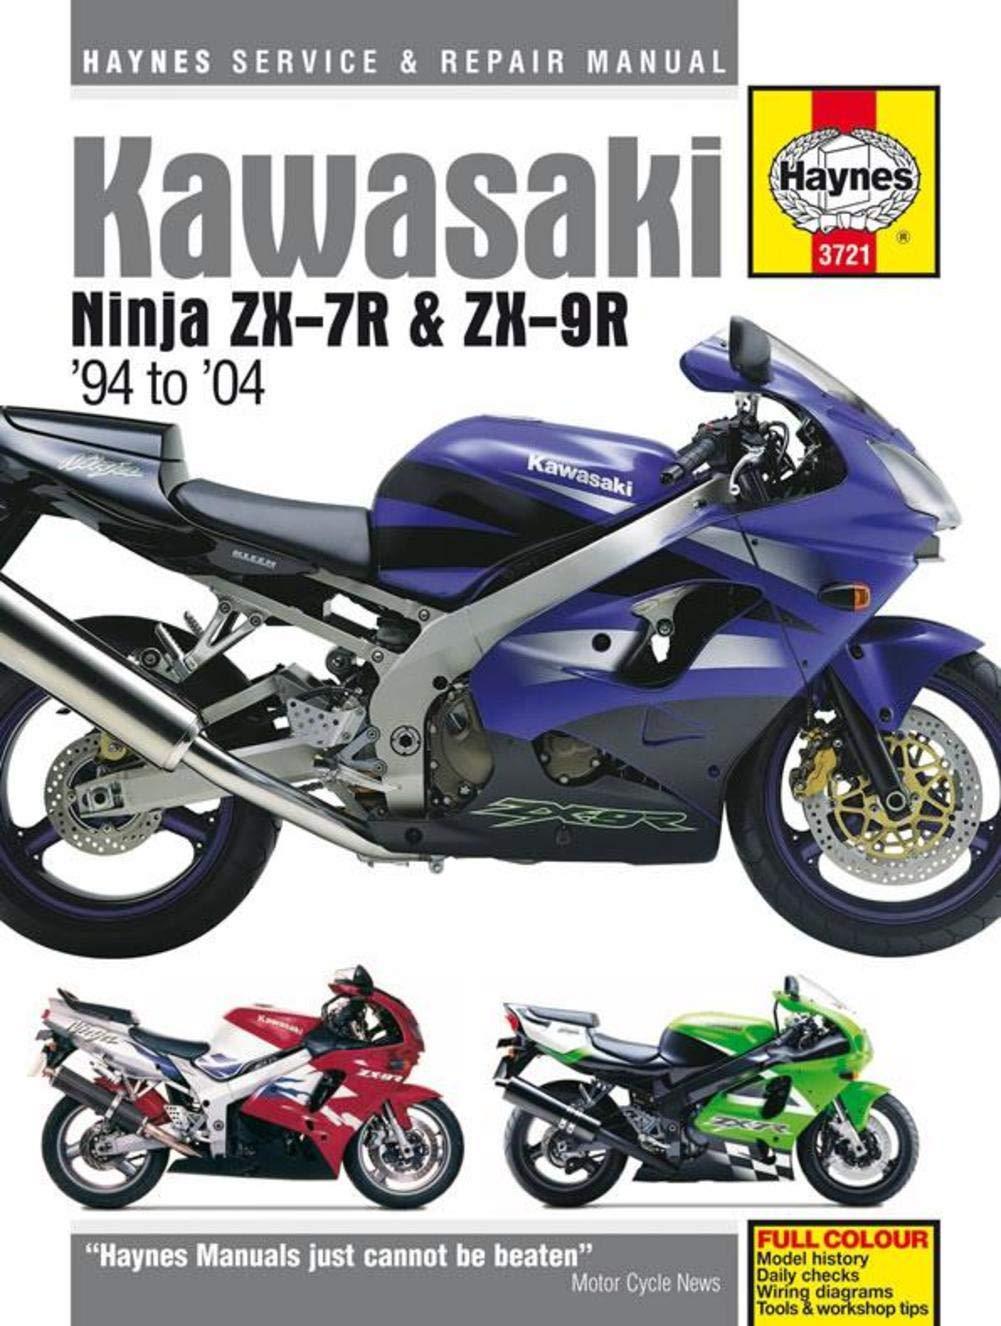 Kawasaki Ninja Zx 7r And 9r Haynes Repair Manual Zx11 Wiring Diagram 1994 2004 Automotive